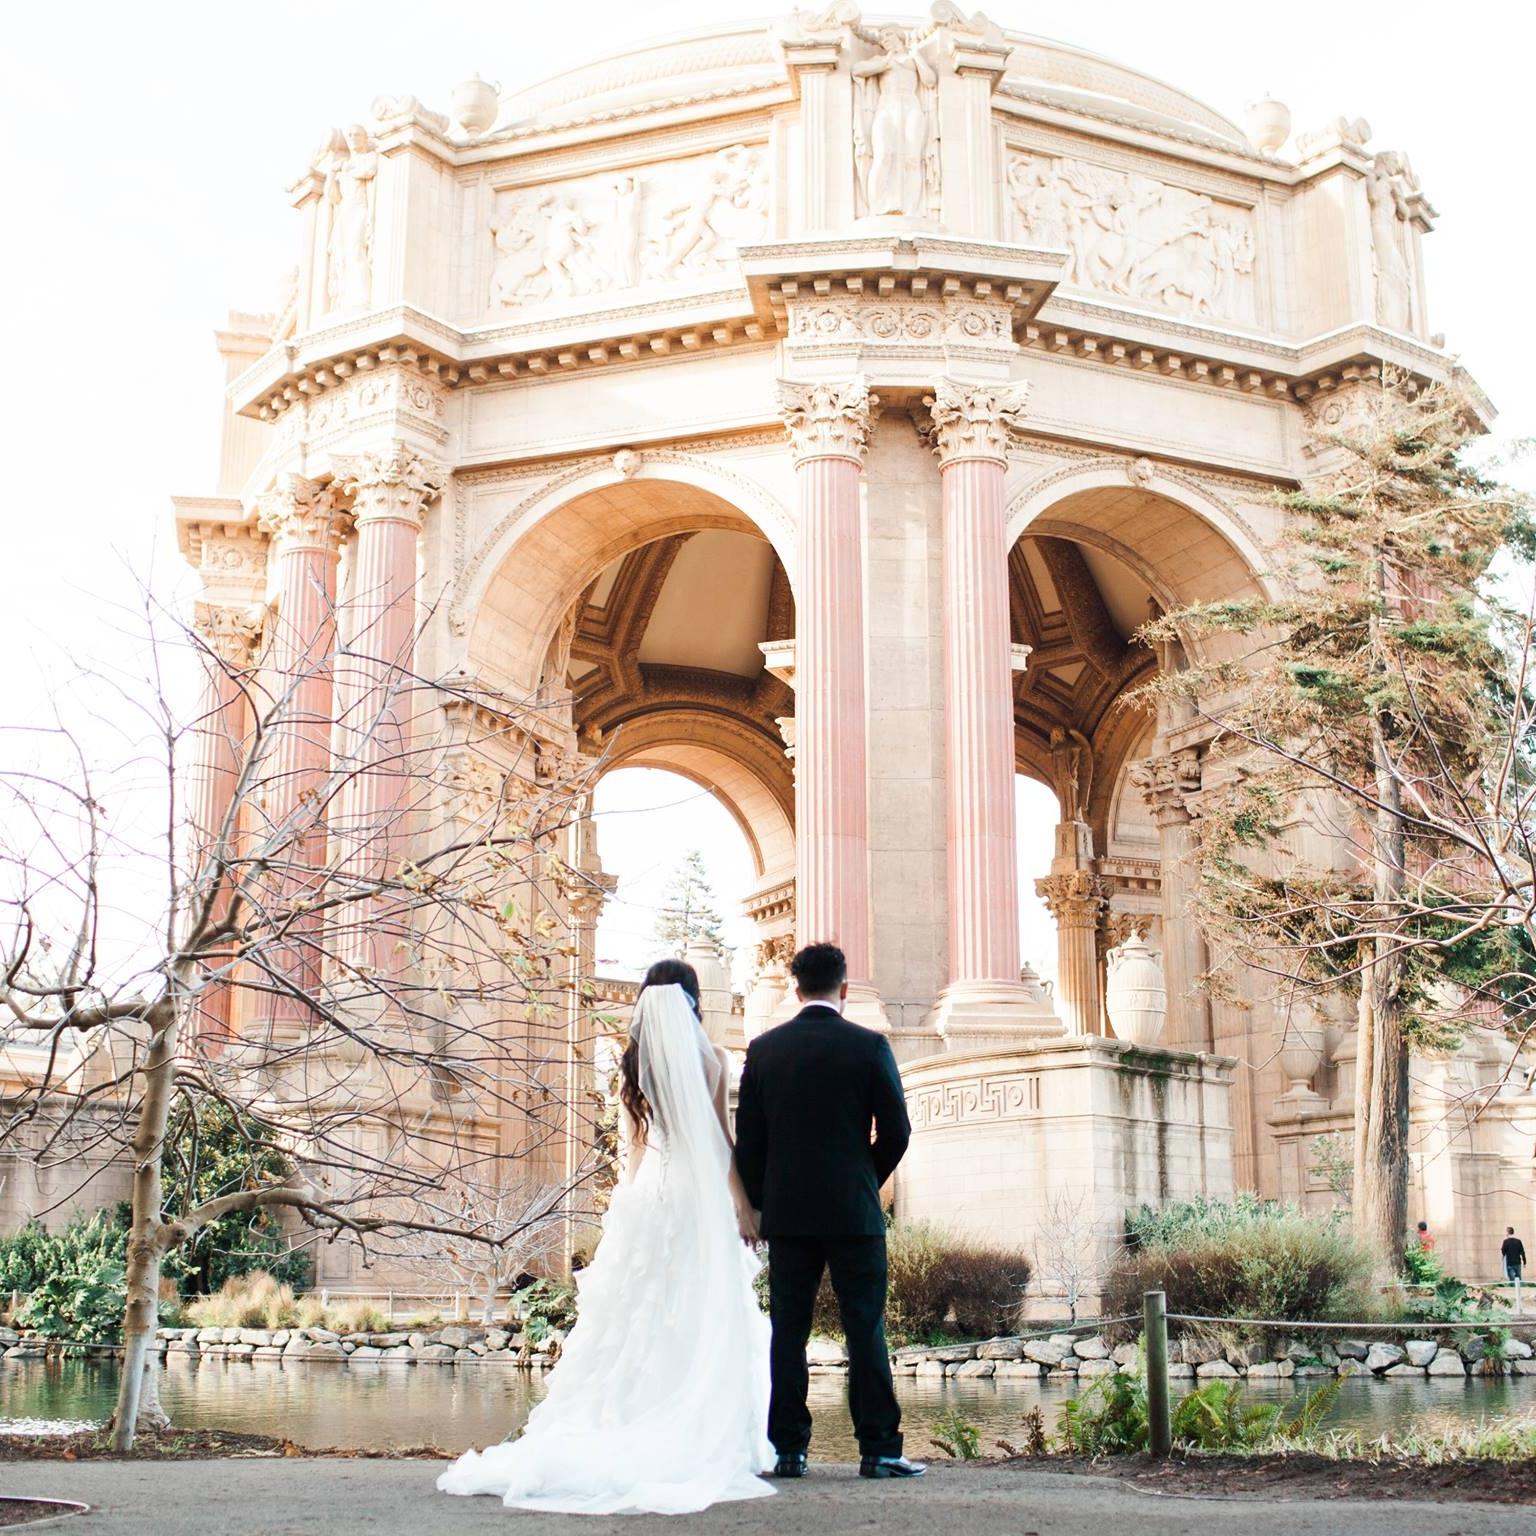 A + O Wedding - Ceremony Location: St. Cecilia Catholic Church, San Francisco, CA /Reception Location: House of Banquets, San Francisco, CA | October 28, 2016